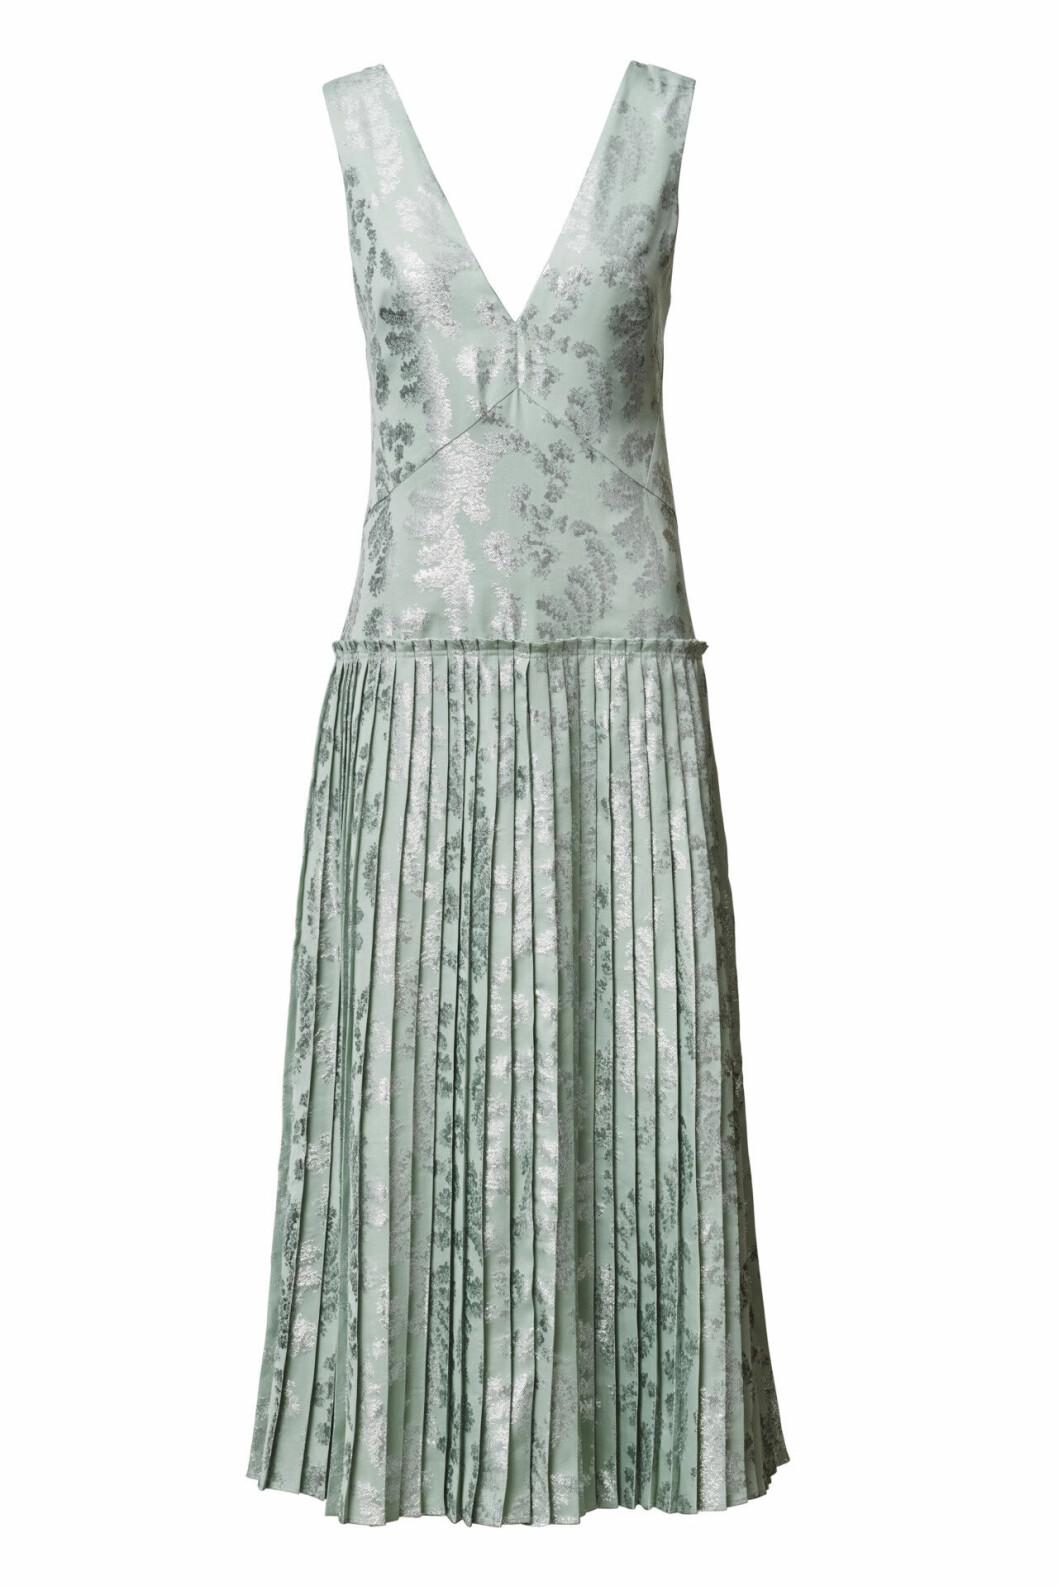 H&M Conscious Exclusive 2019 plisserad klänning